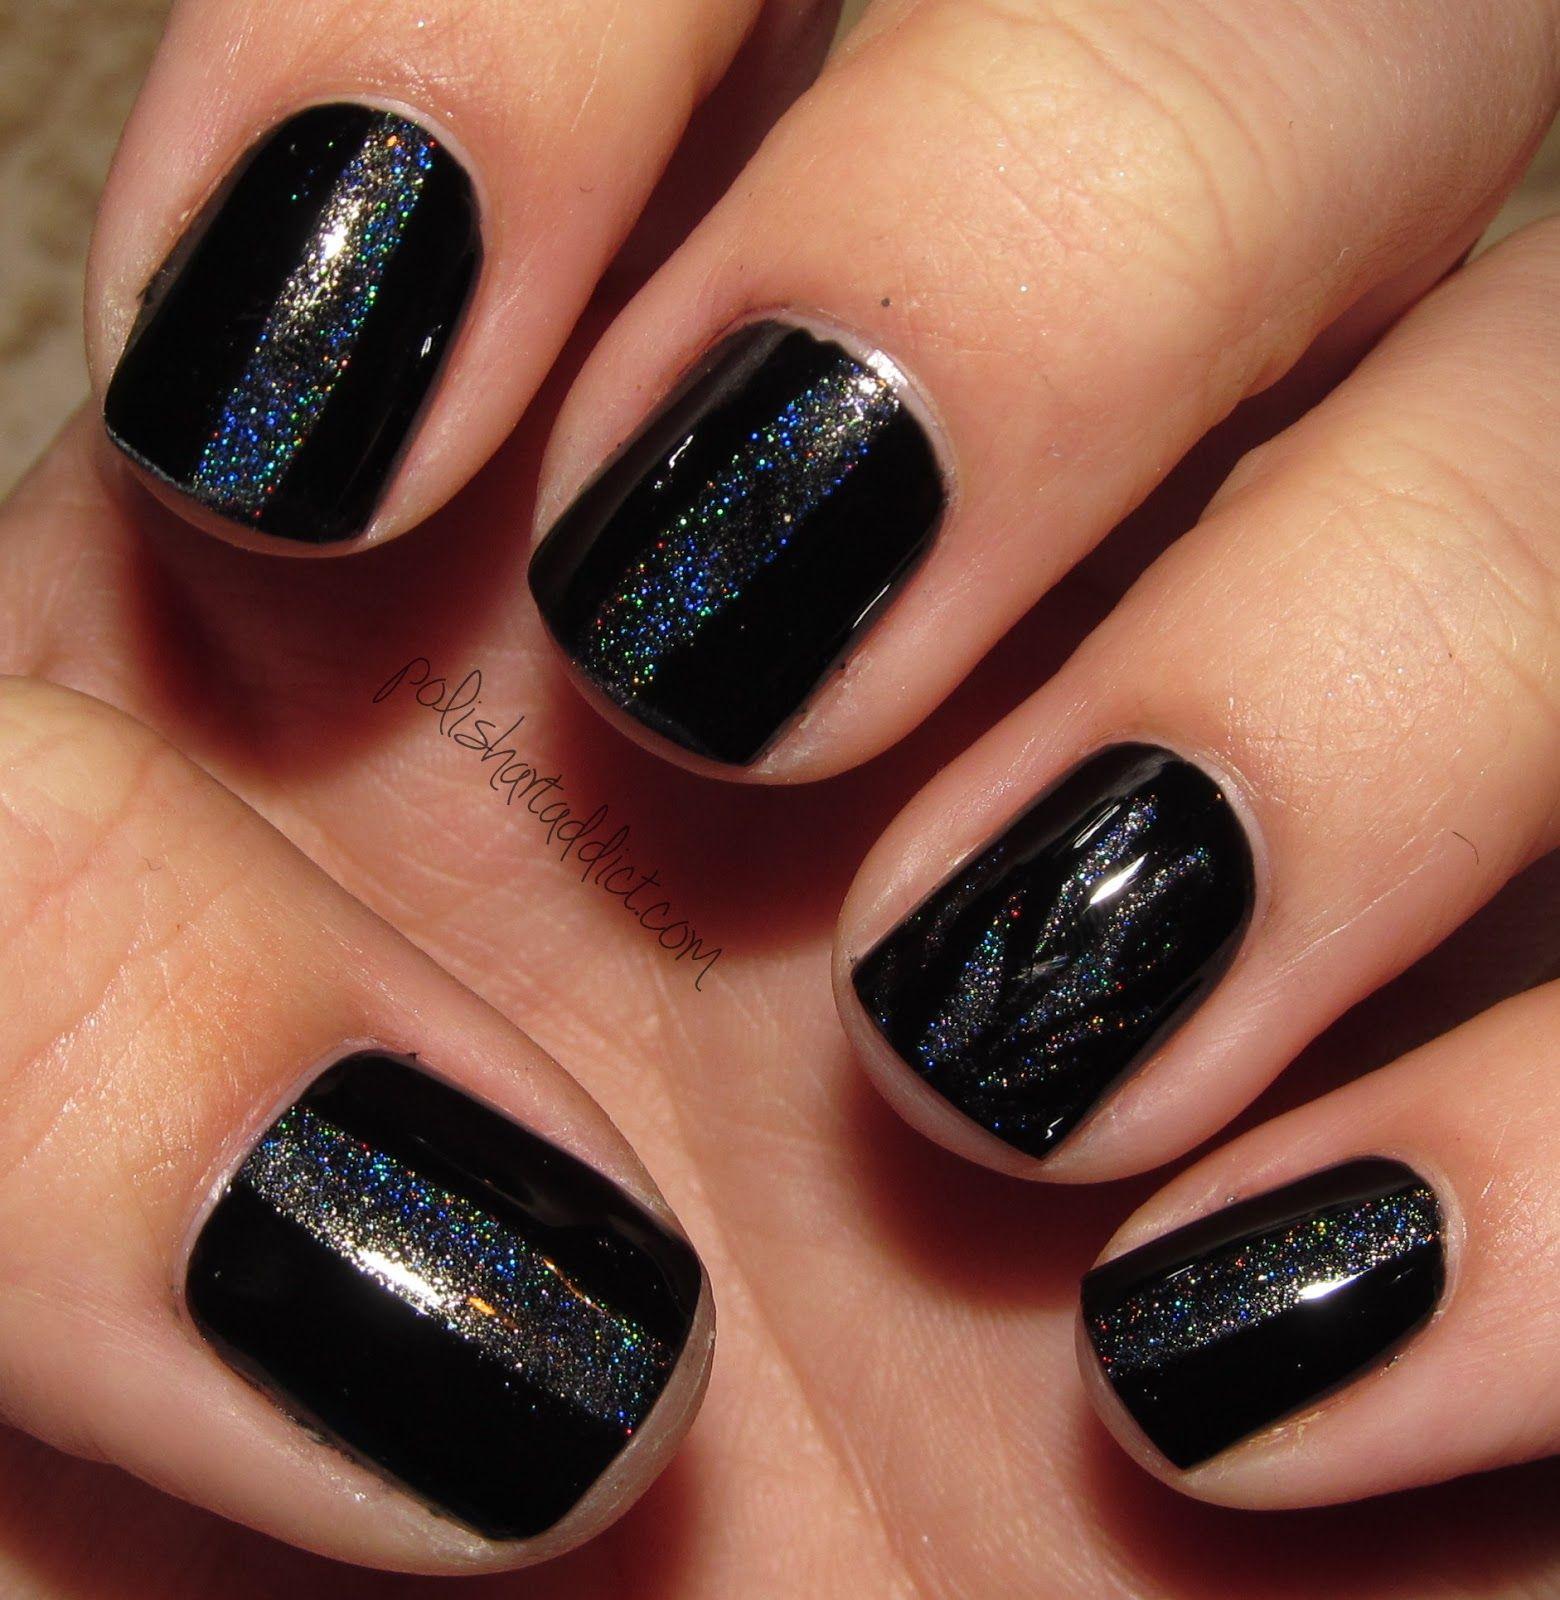 Concrete And Nail Polish Striped Nail Art: Black Polish With Black Glitter Nail Stripe Nail Art I